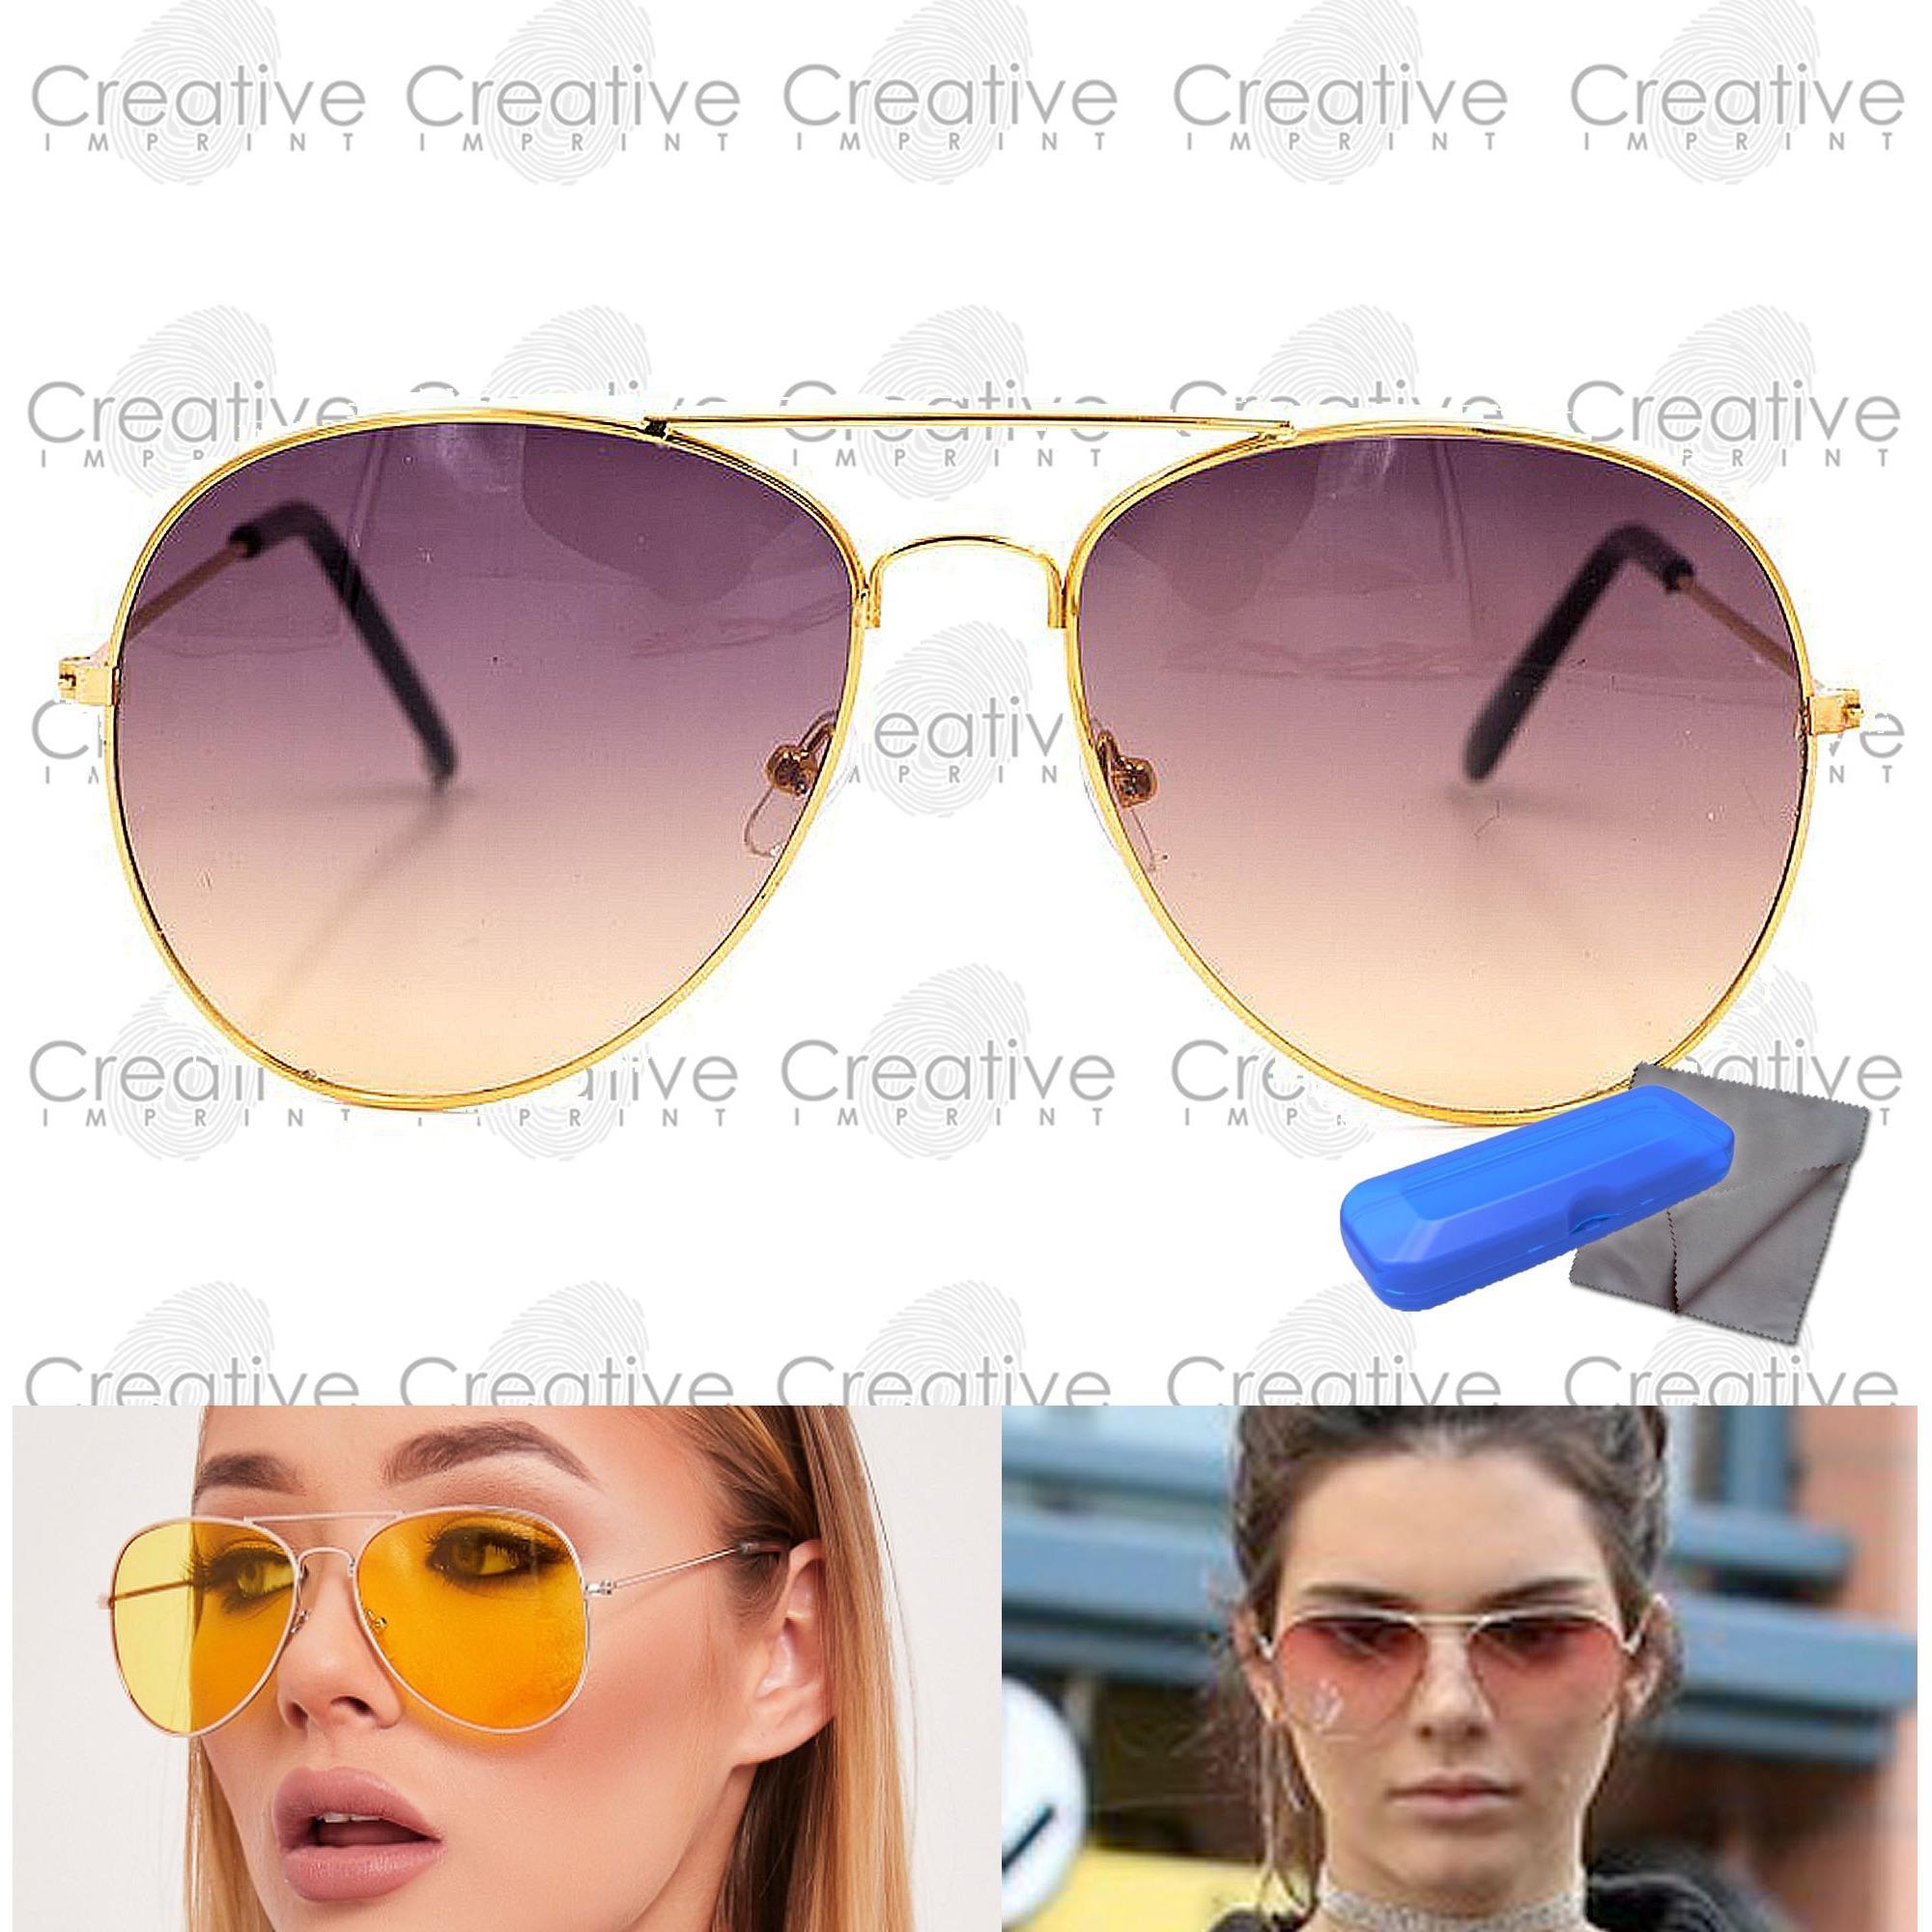 c91fd4b0446 Creative Imprint Aviator Tinted Lens Two-Tone Gradient Teardrop Sunnies  Trendy Fashion Sunglasses Shades Eyewear